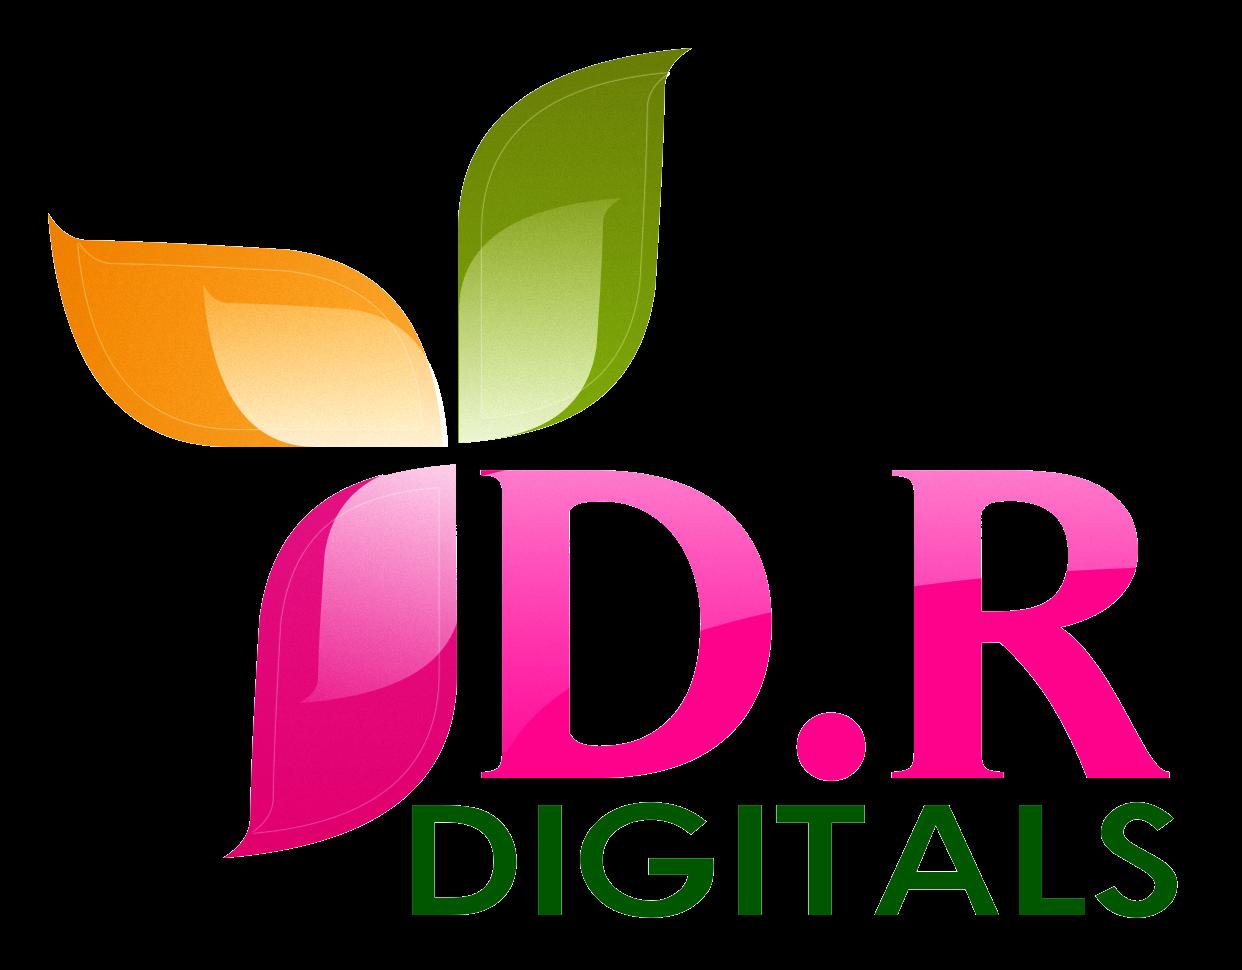 Digital Printing Logo Png | www.imgkid.com - The Image Kid ...